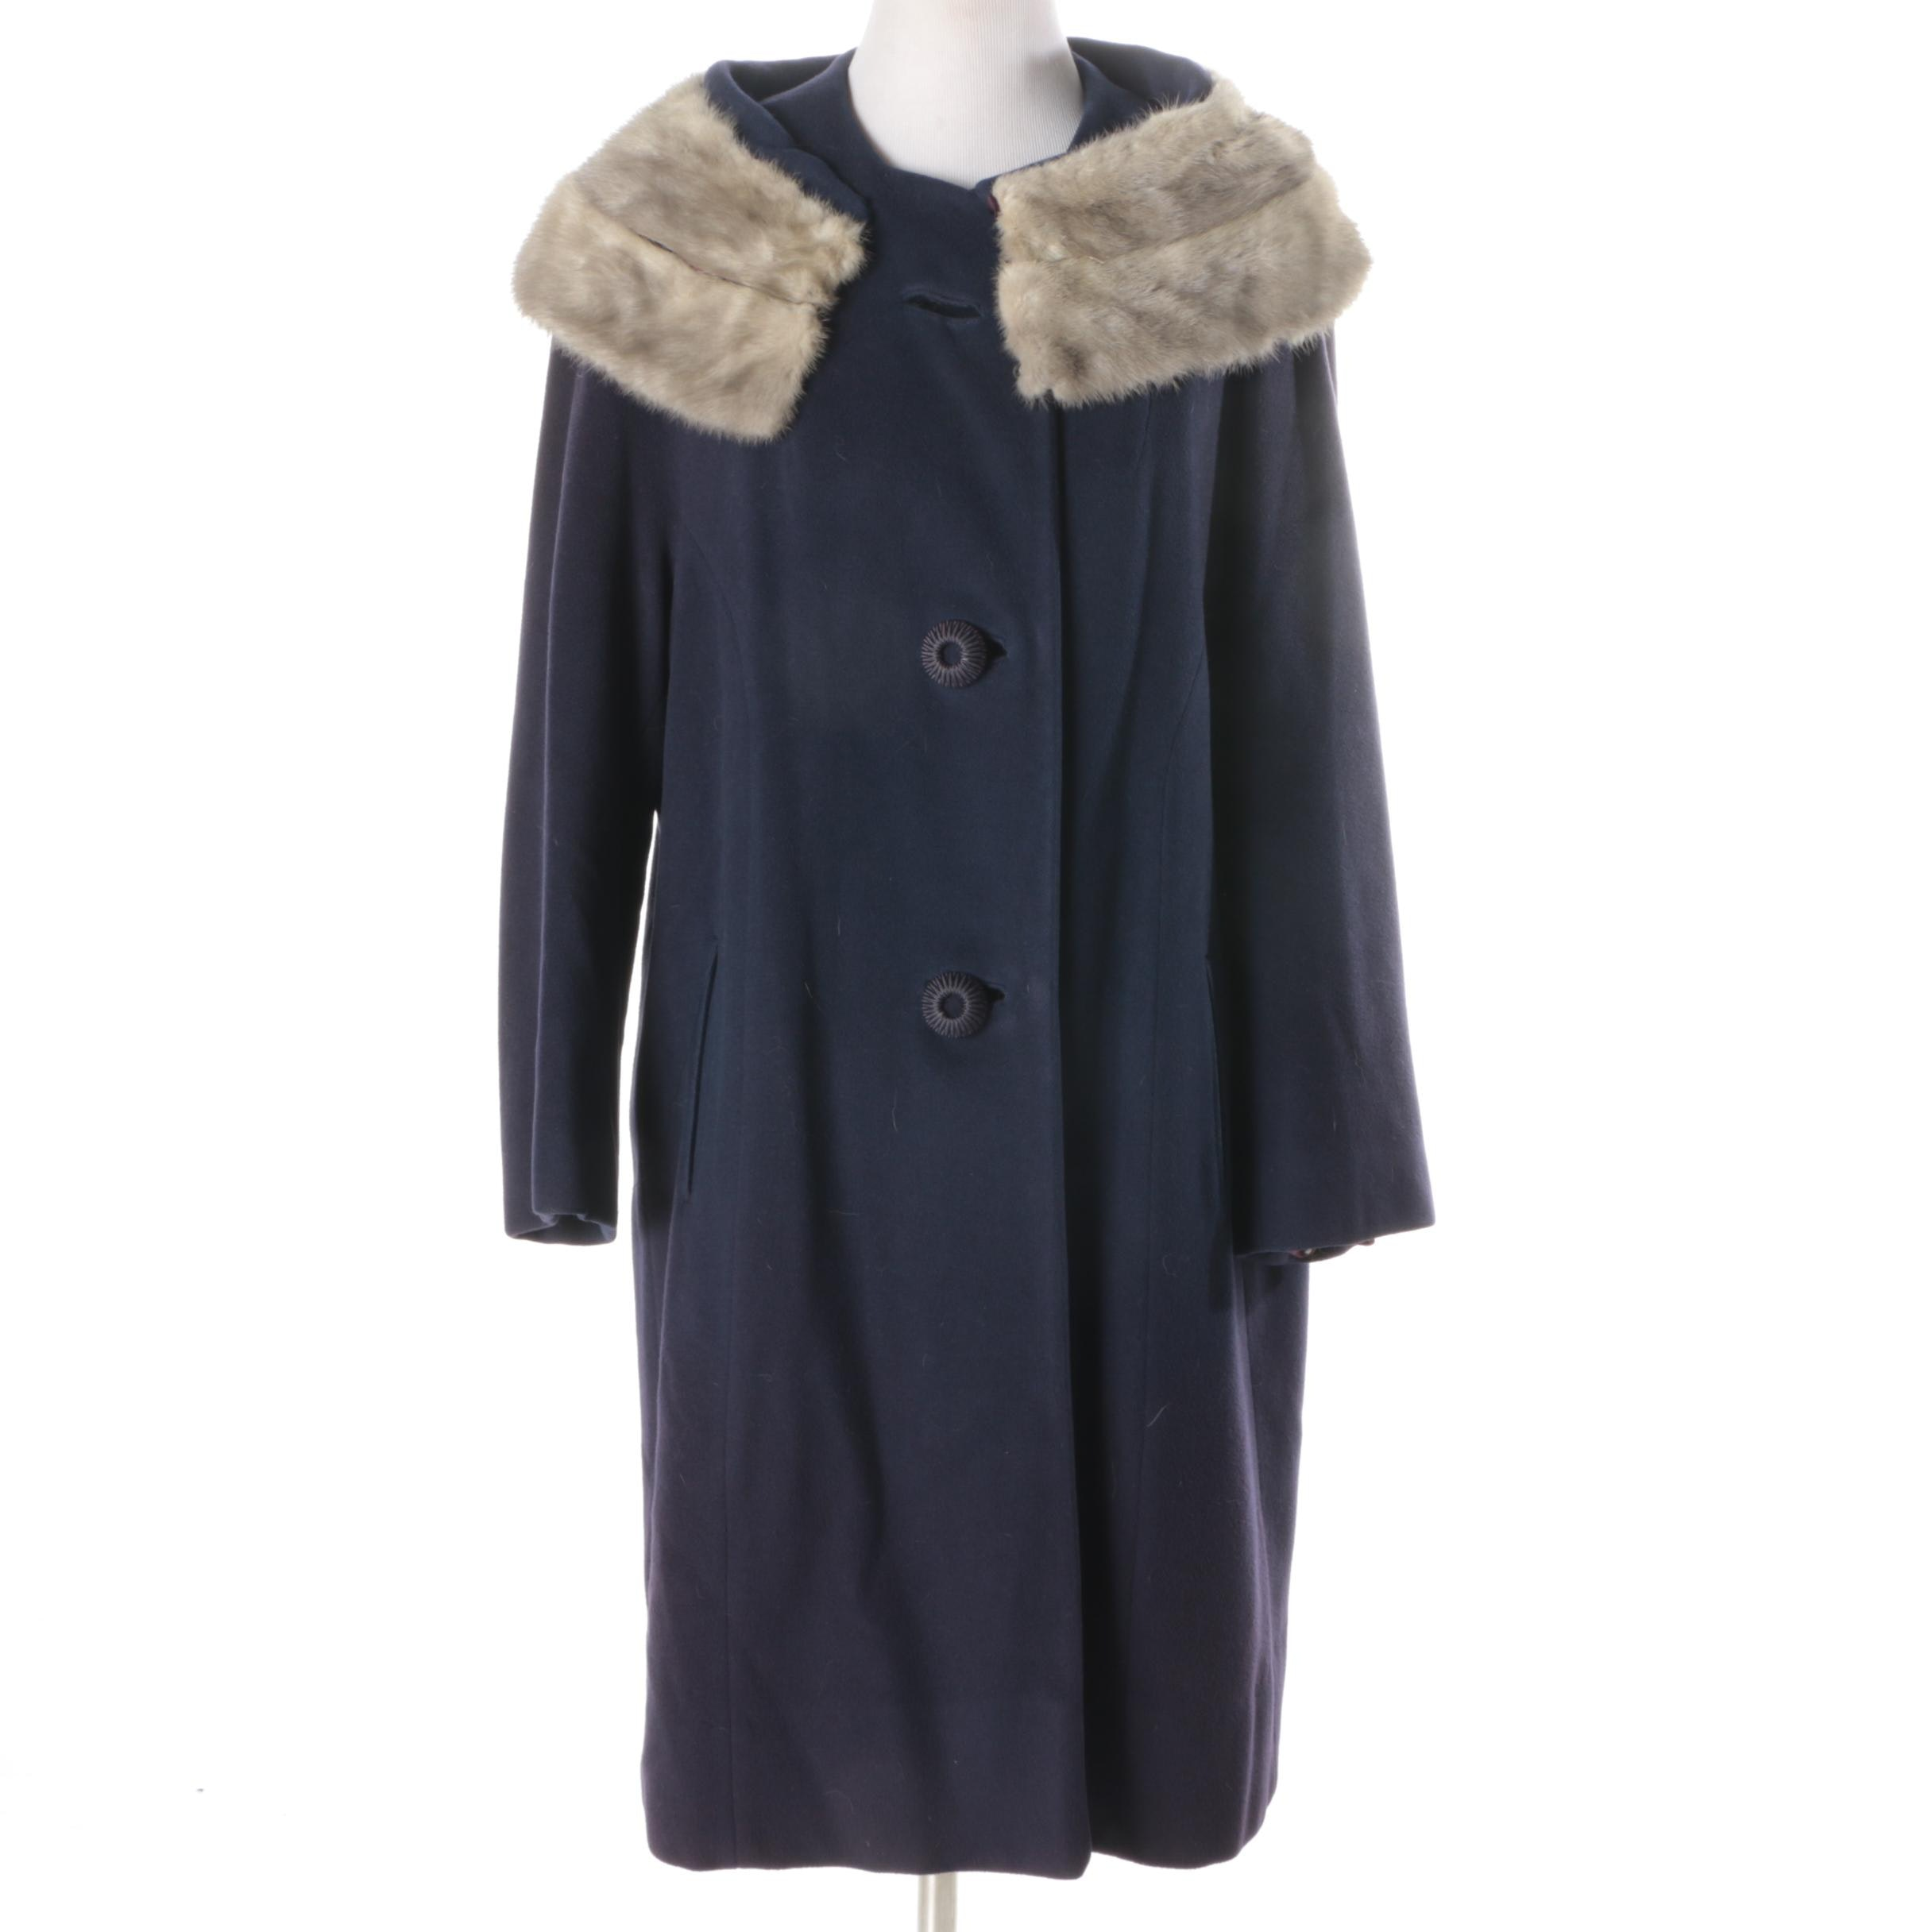 Women's Vintage Navy Blue Wool Coat with Mink Fur Collar